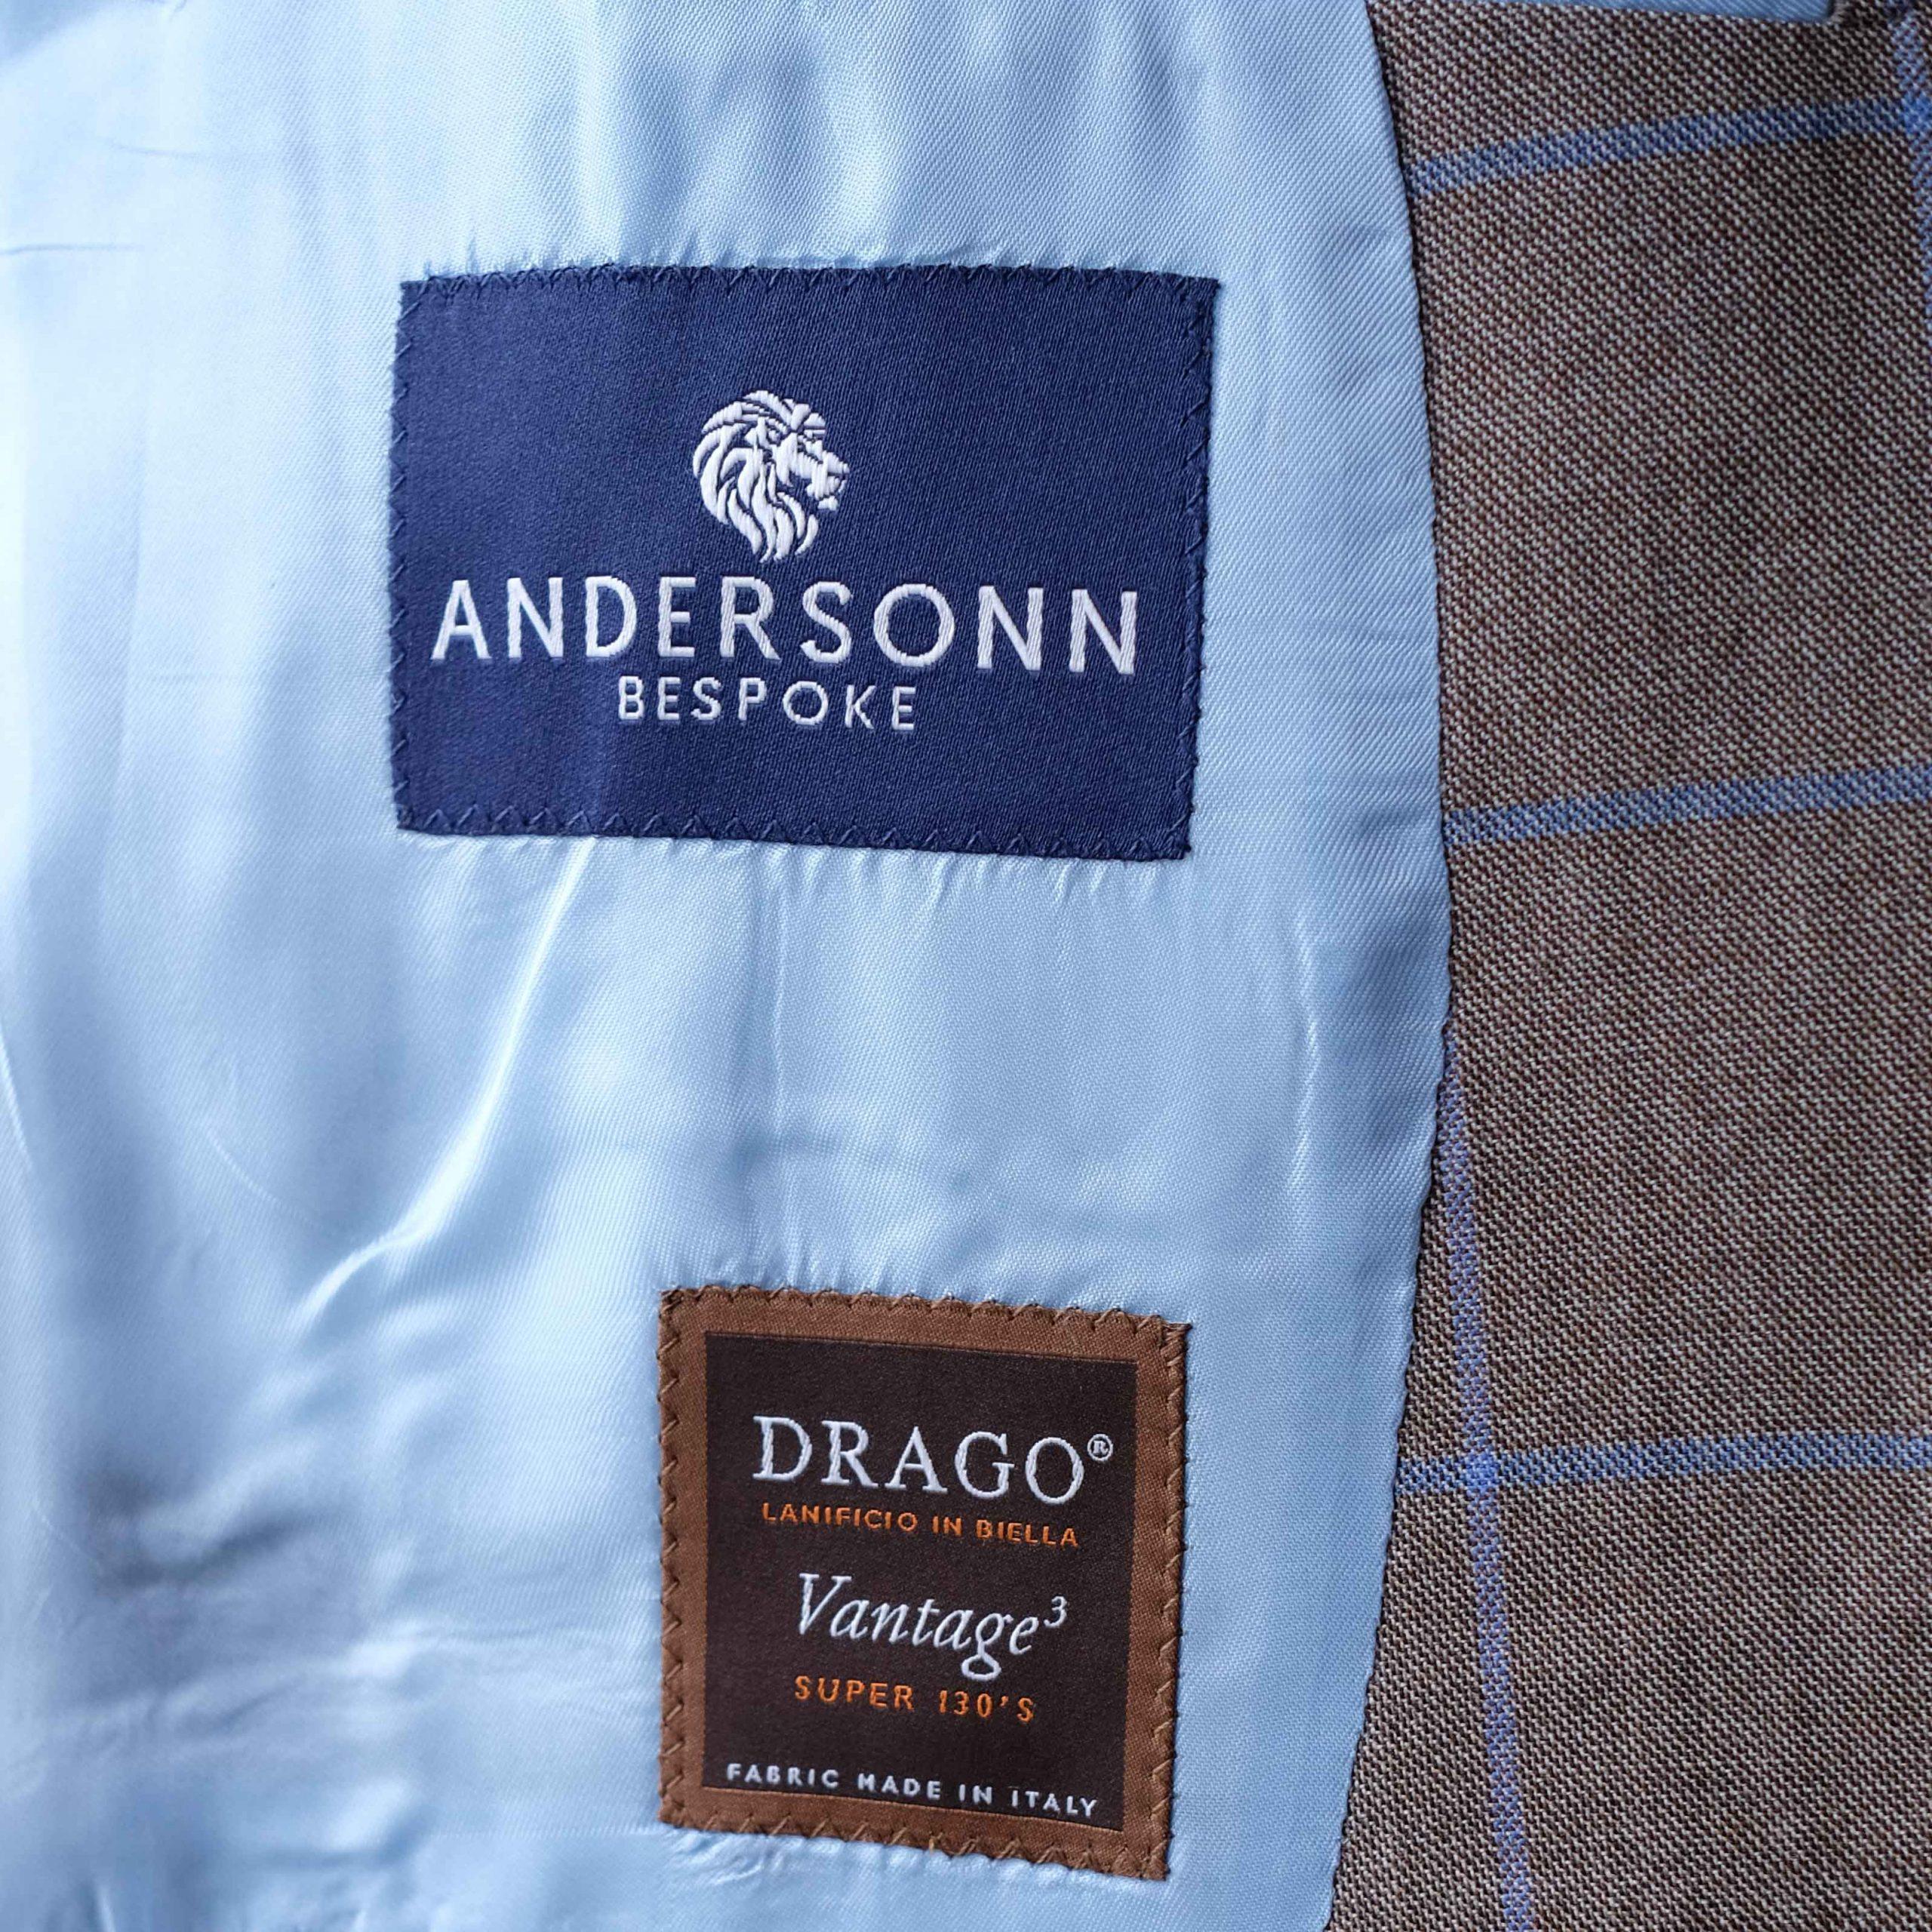 Andersonn Bespoke Label - Drago Biella Italy